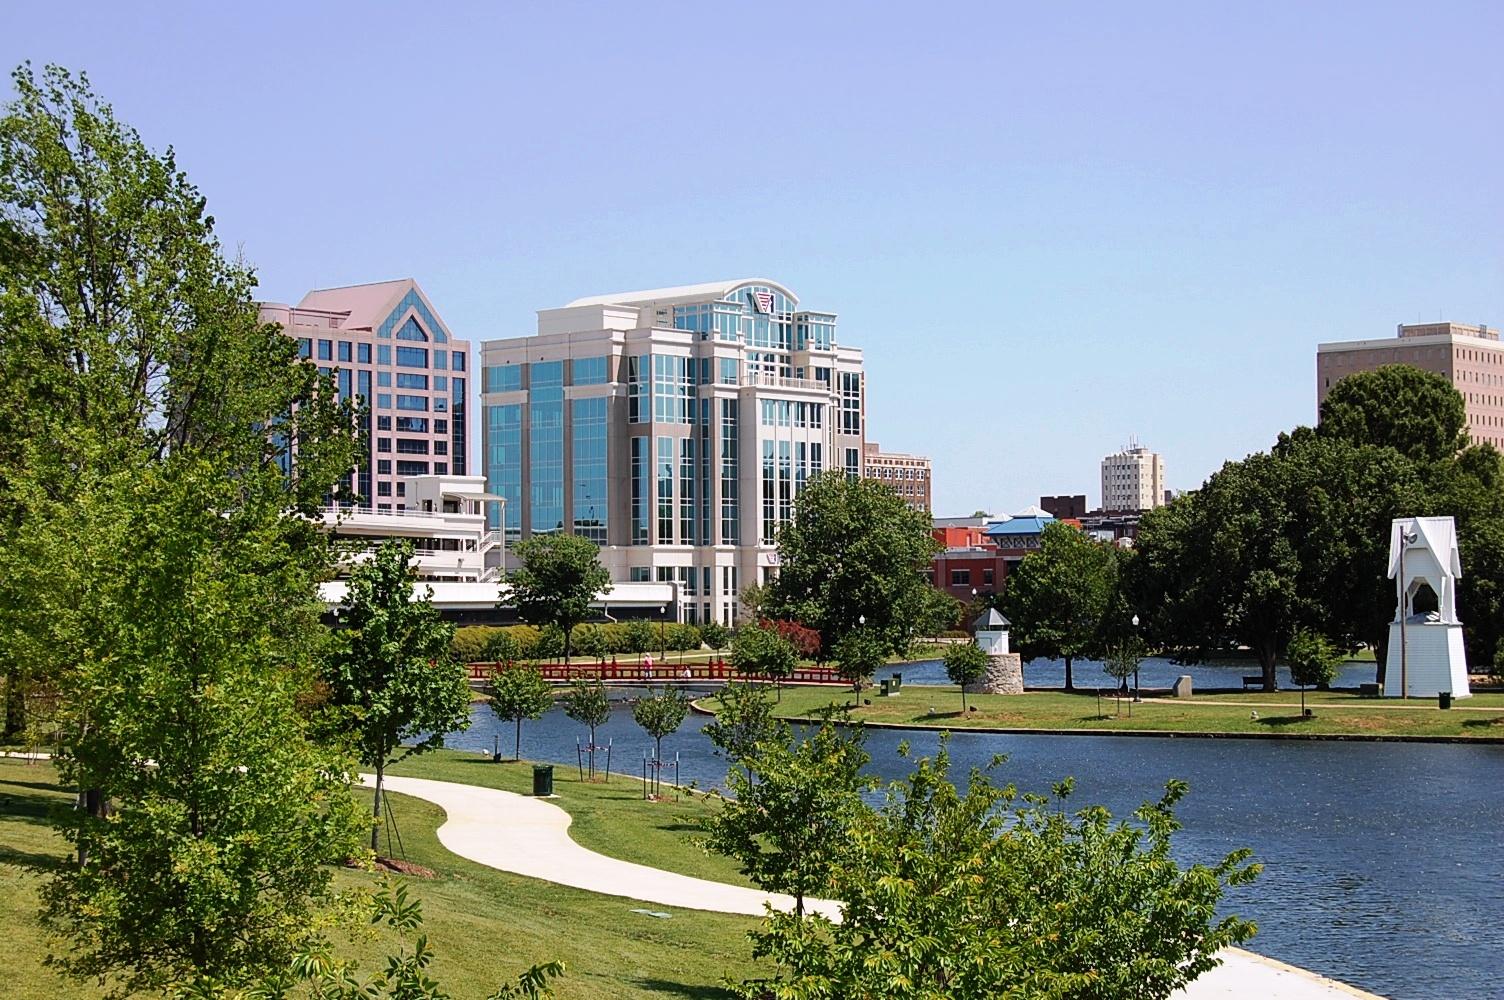 Encompass Health Rehabilitation Hospital of North Alabama Profile at